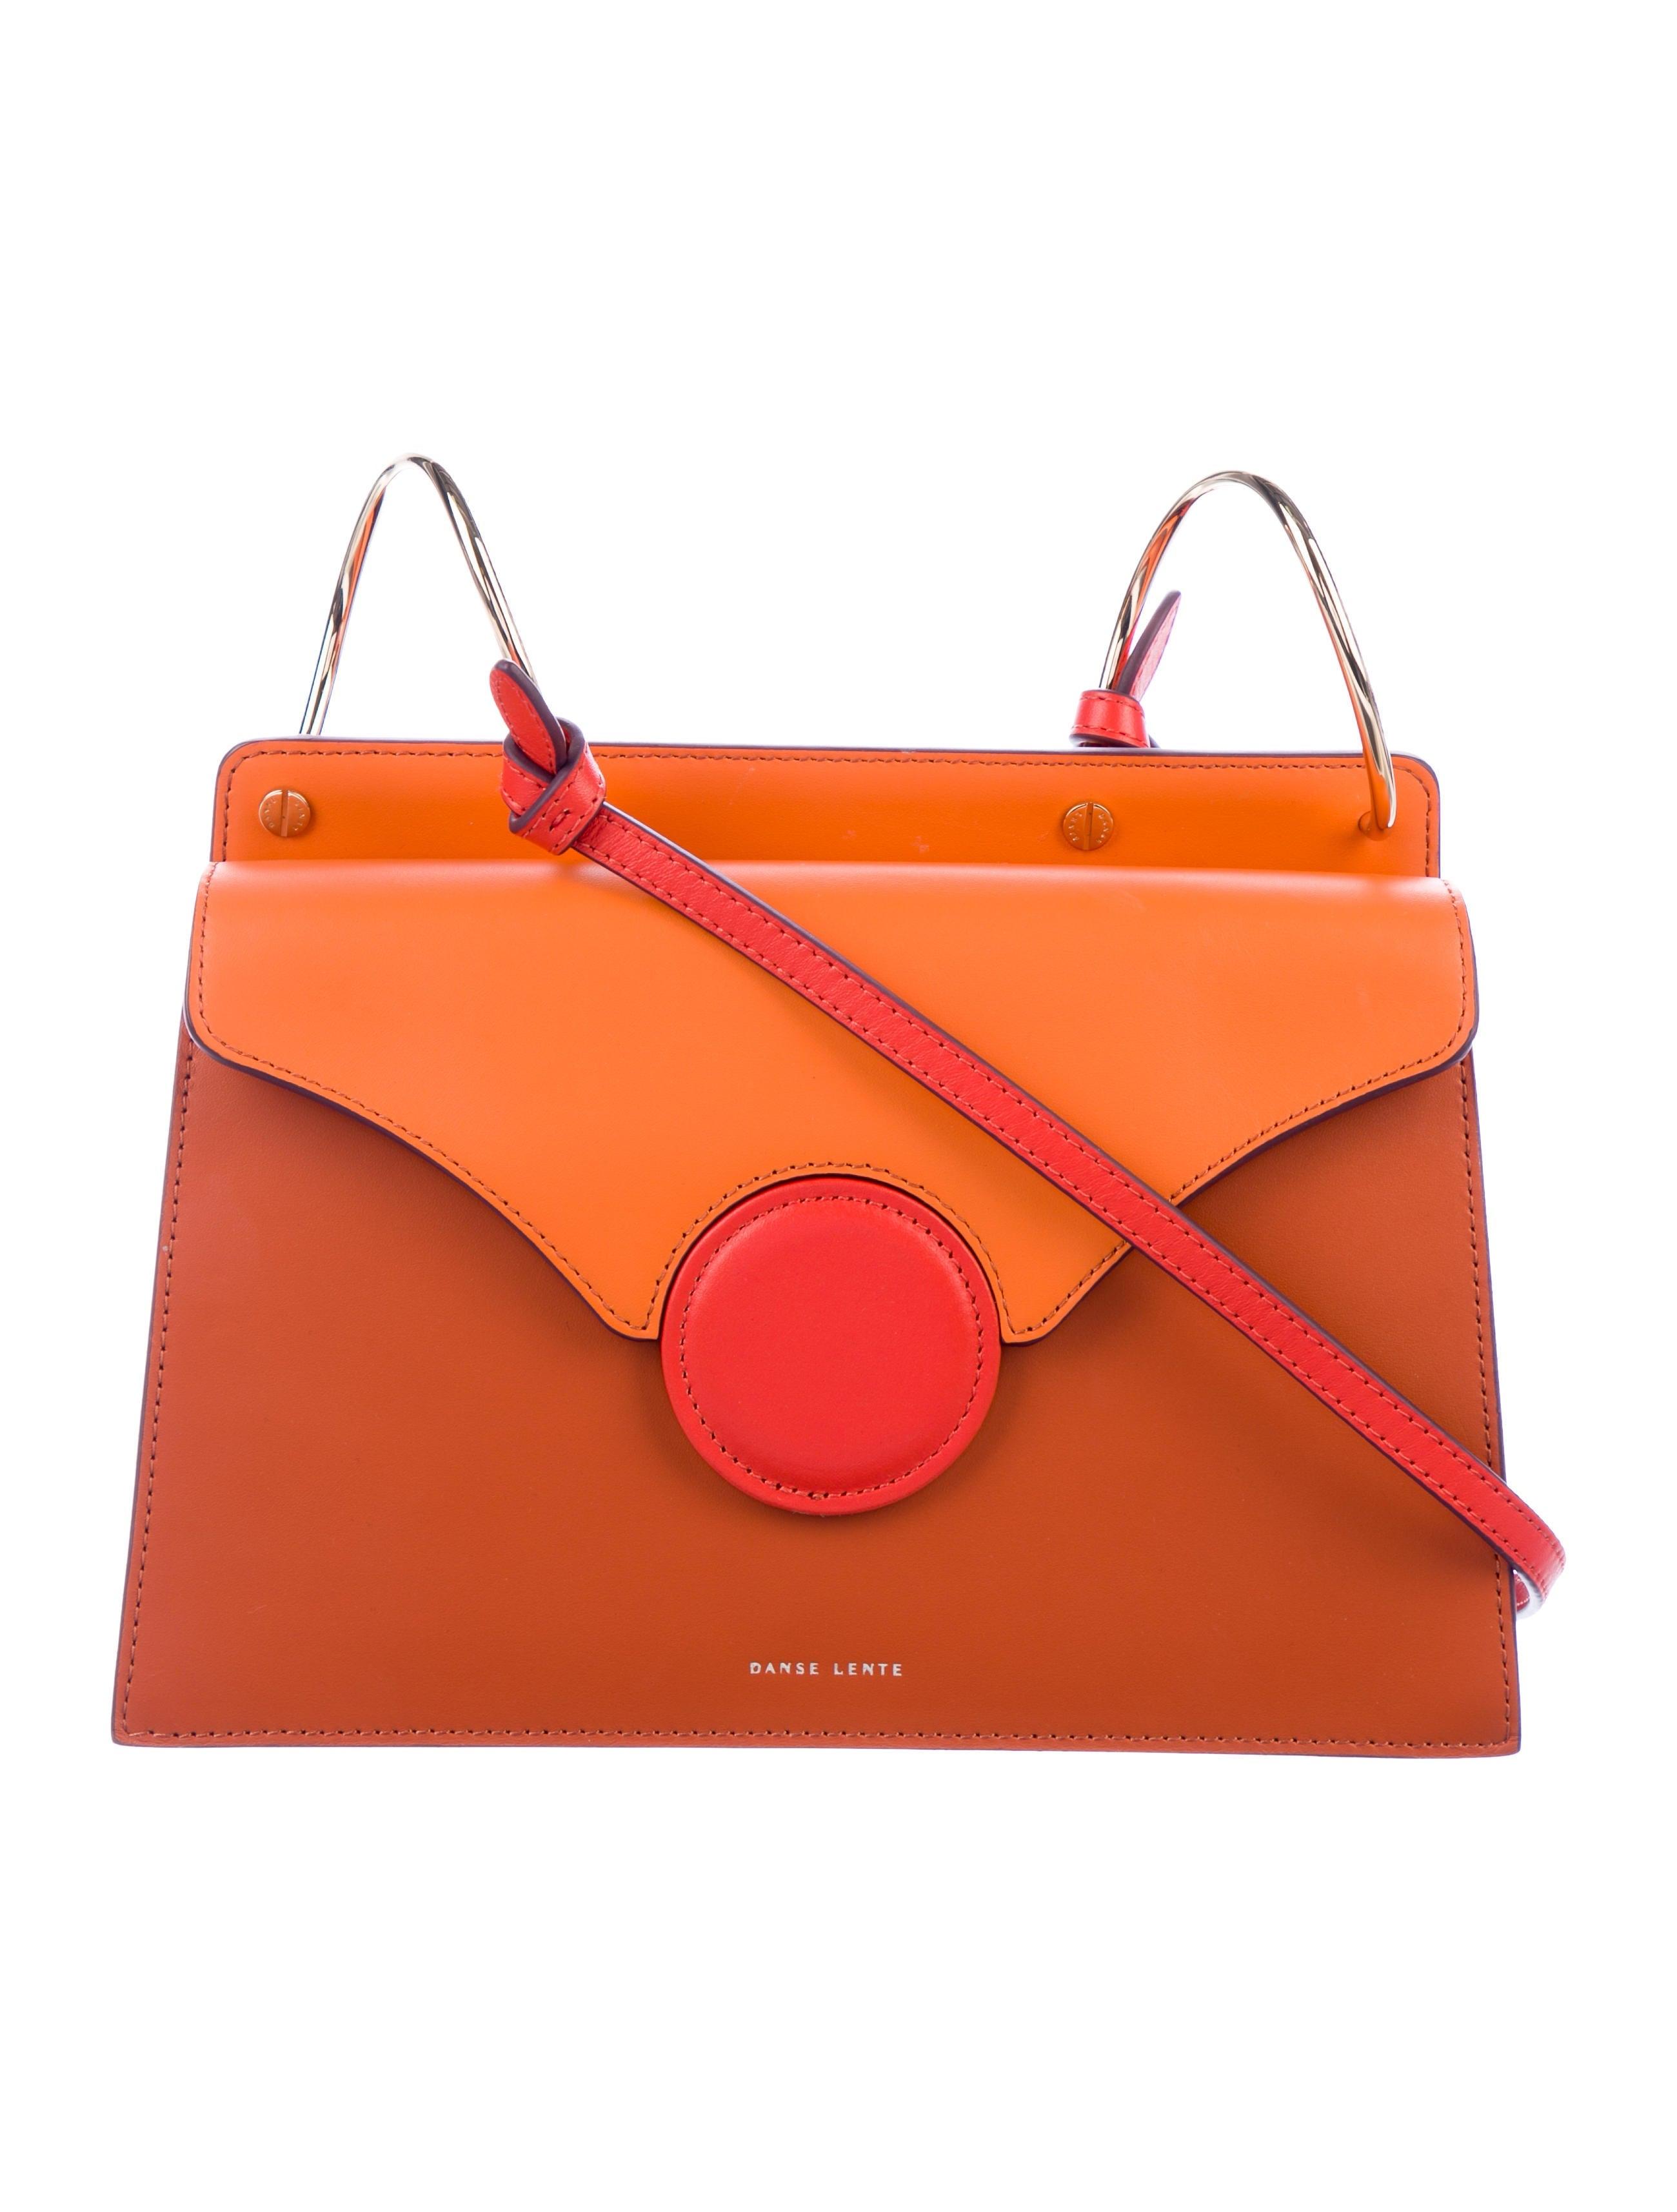 42c535e18b87 Handbags | The RealReal